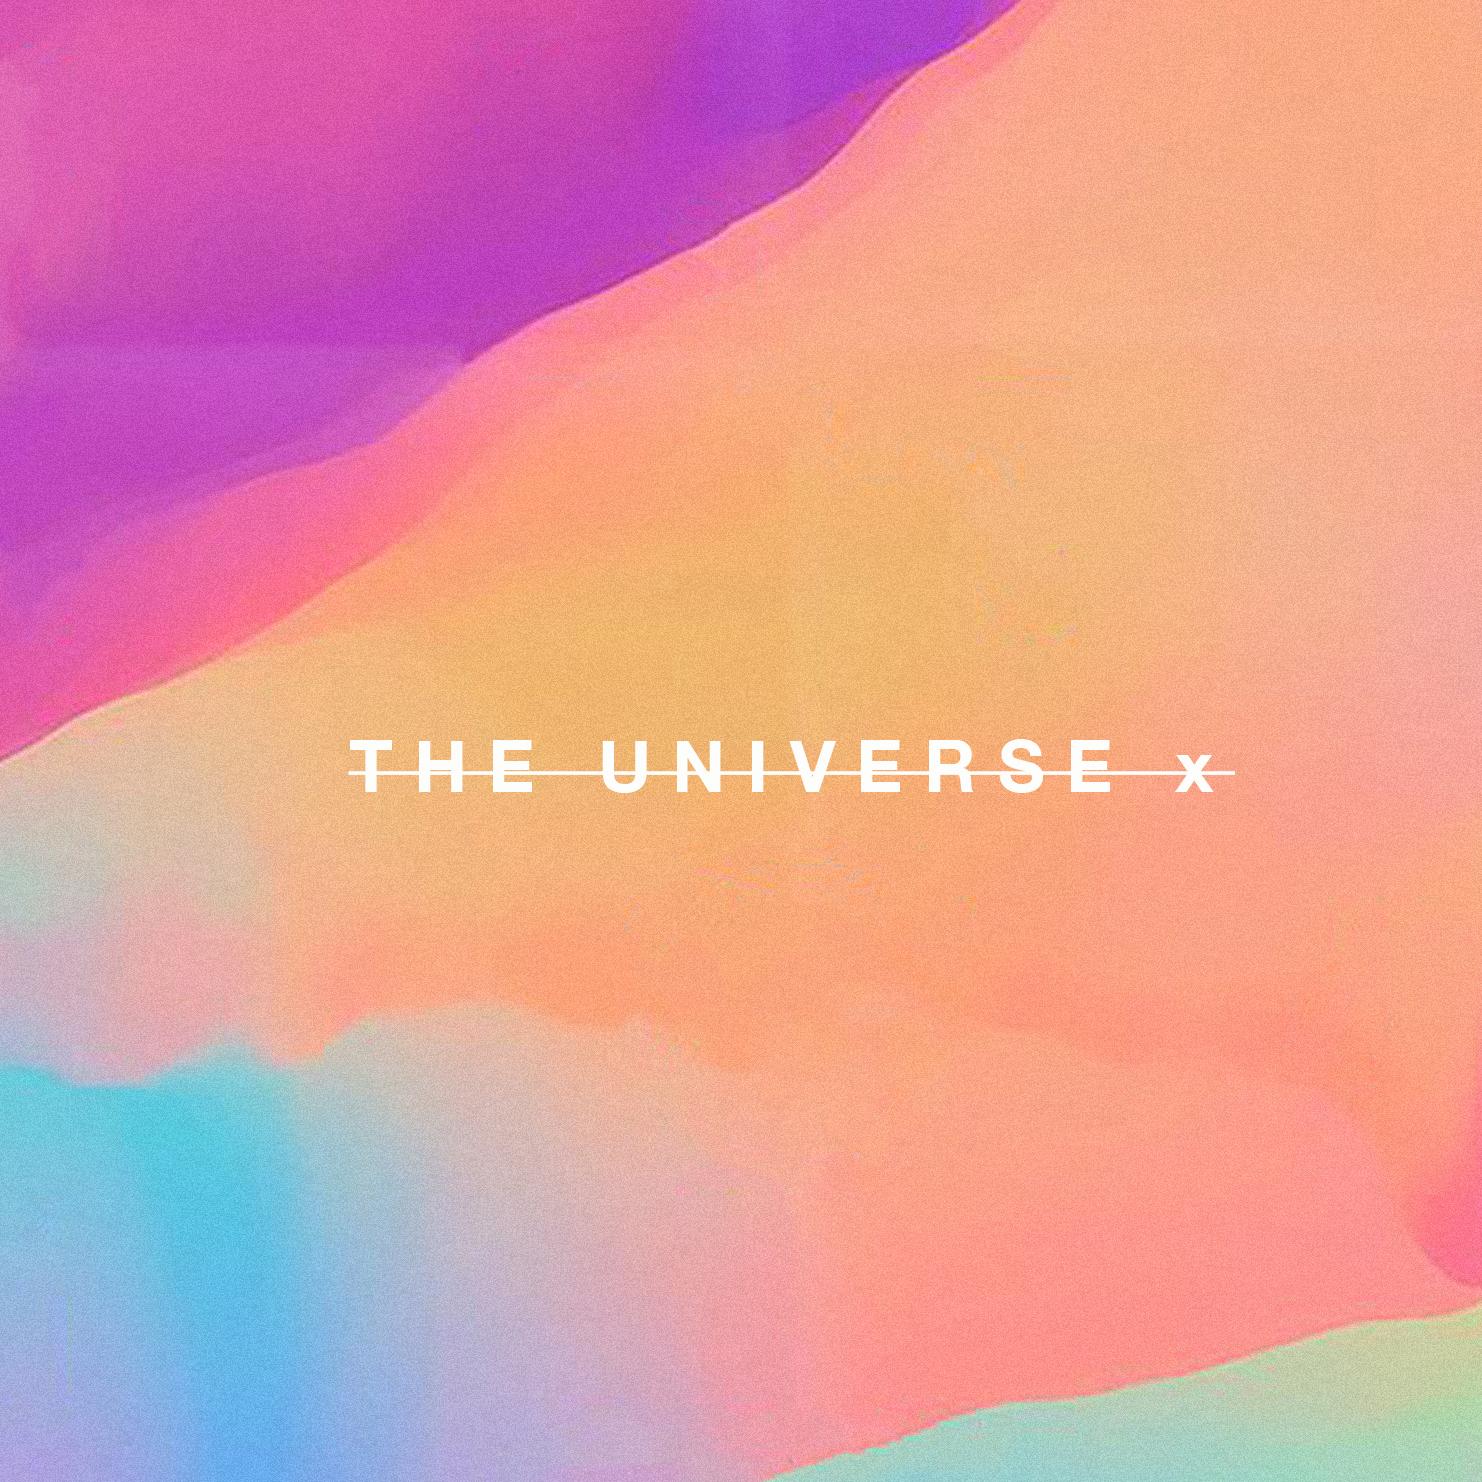 universe-LOGO-WEB-S.jpg